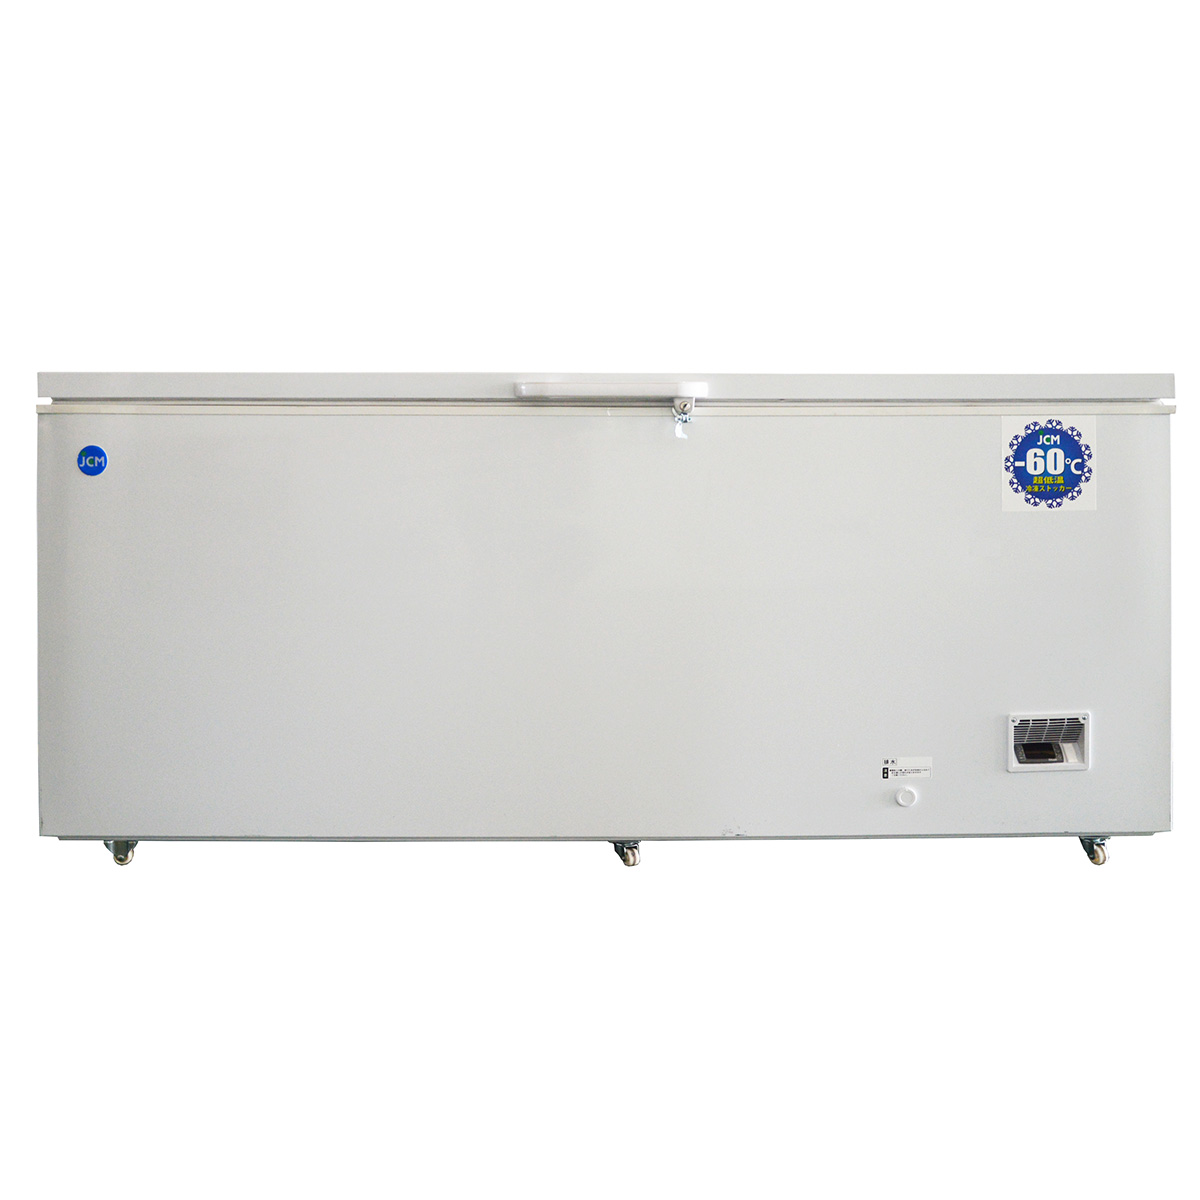 JCM 超低温冷凍ストッカー 450L JCMCC-450 業務用 -60℃ 超低温 冷凍庫 冷凍ストッカー ストッカー 【代引不可】